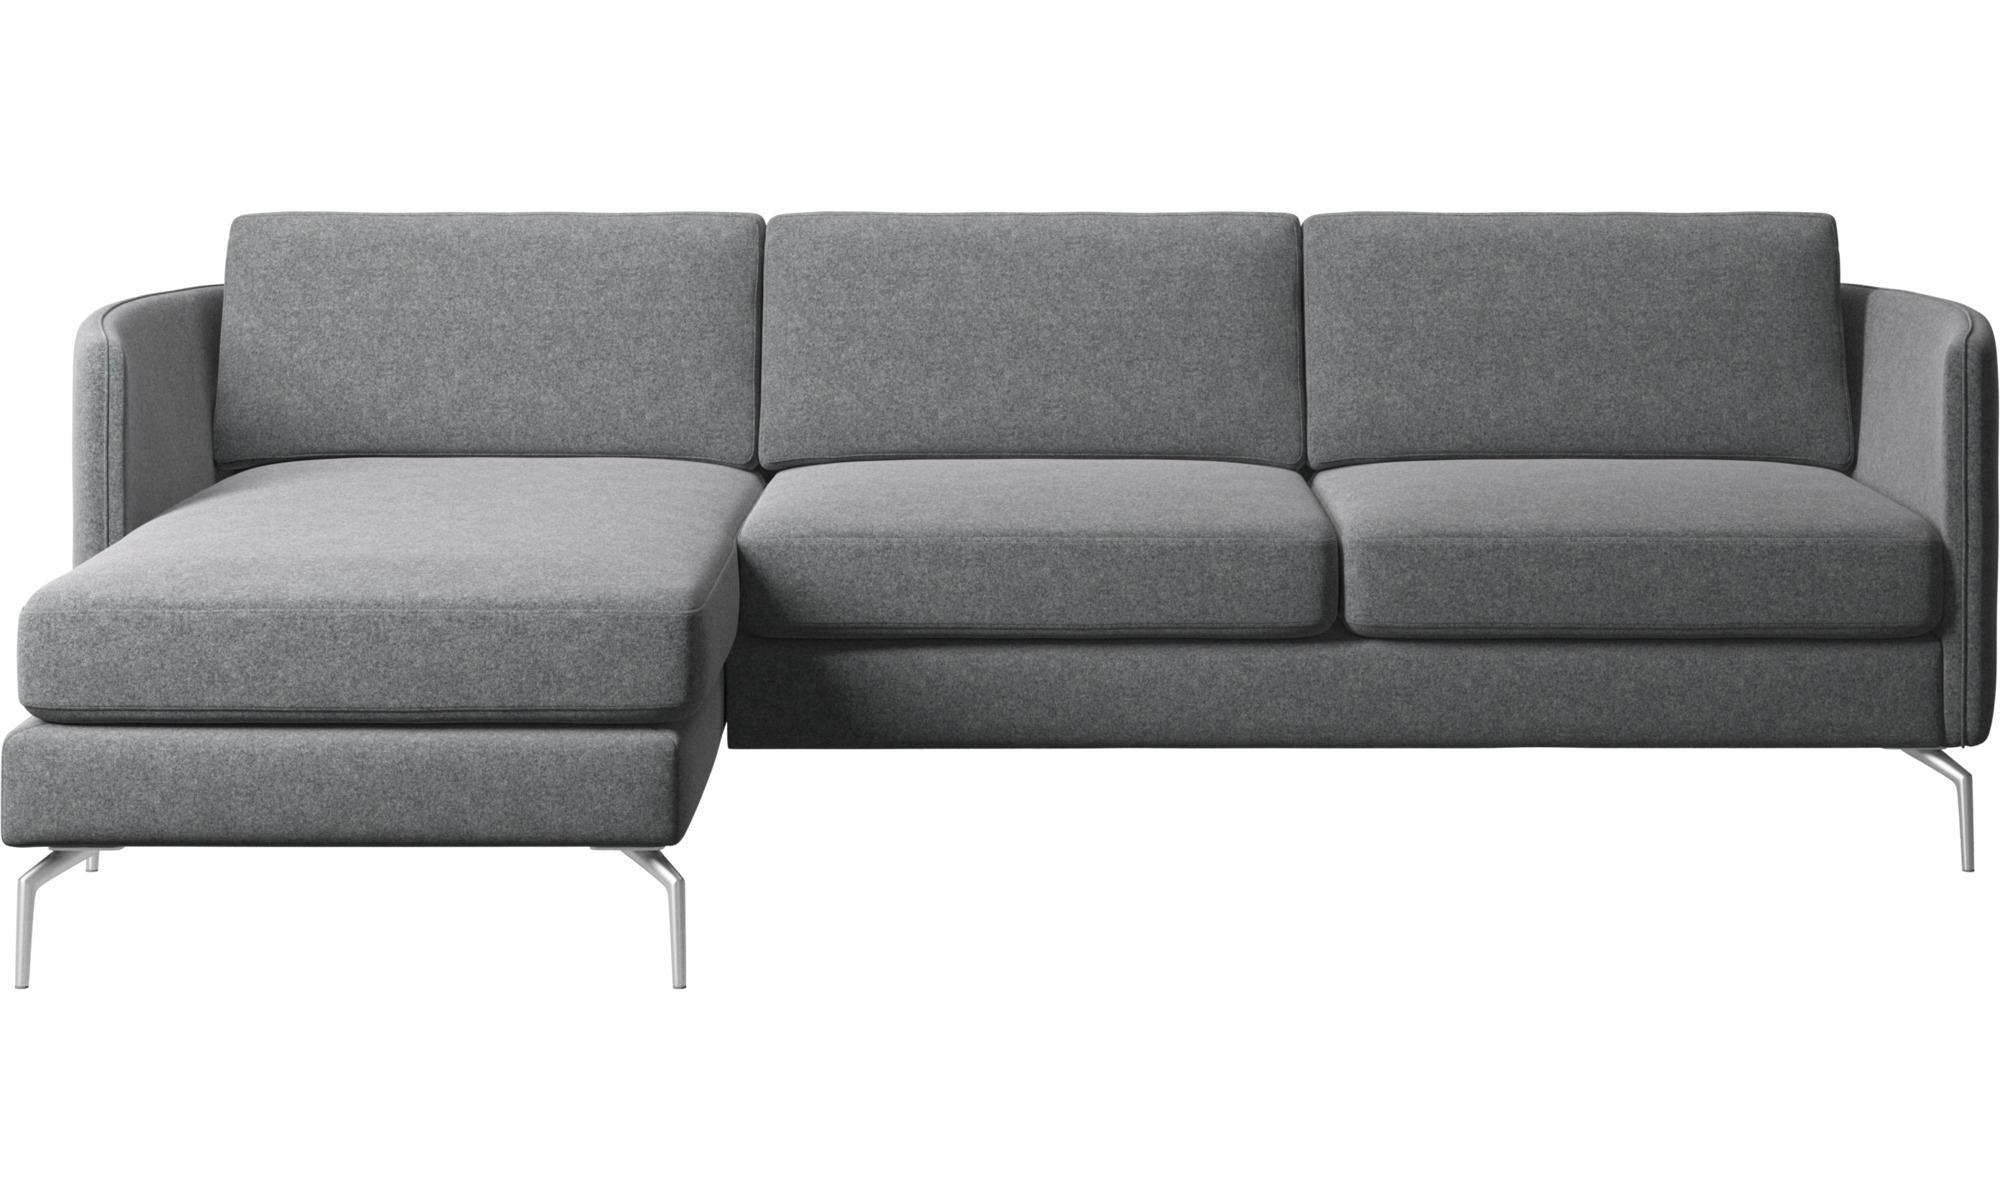 Chaise longue sofas - Osaka sofa with resting unit, regular seat - Grey - Fabric